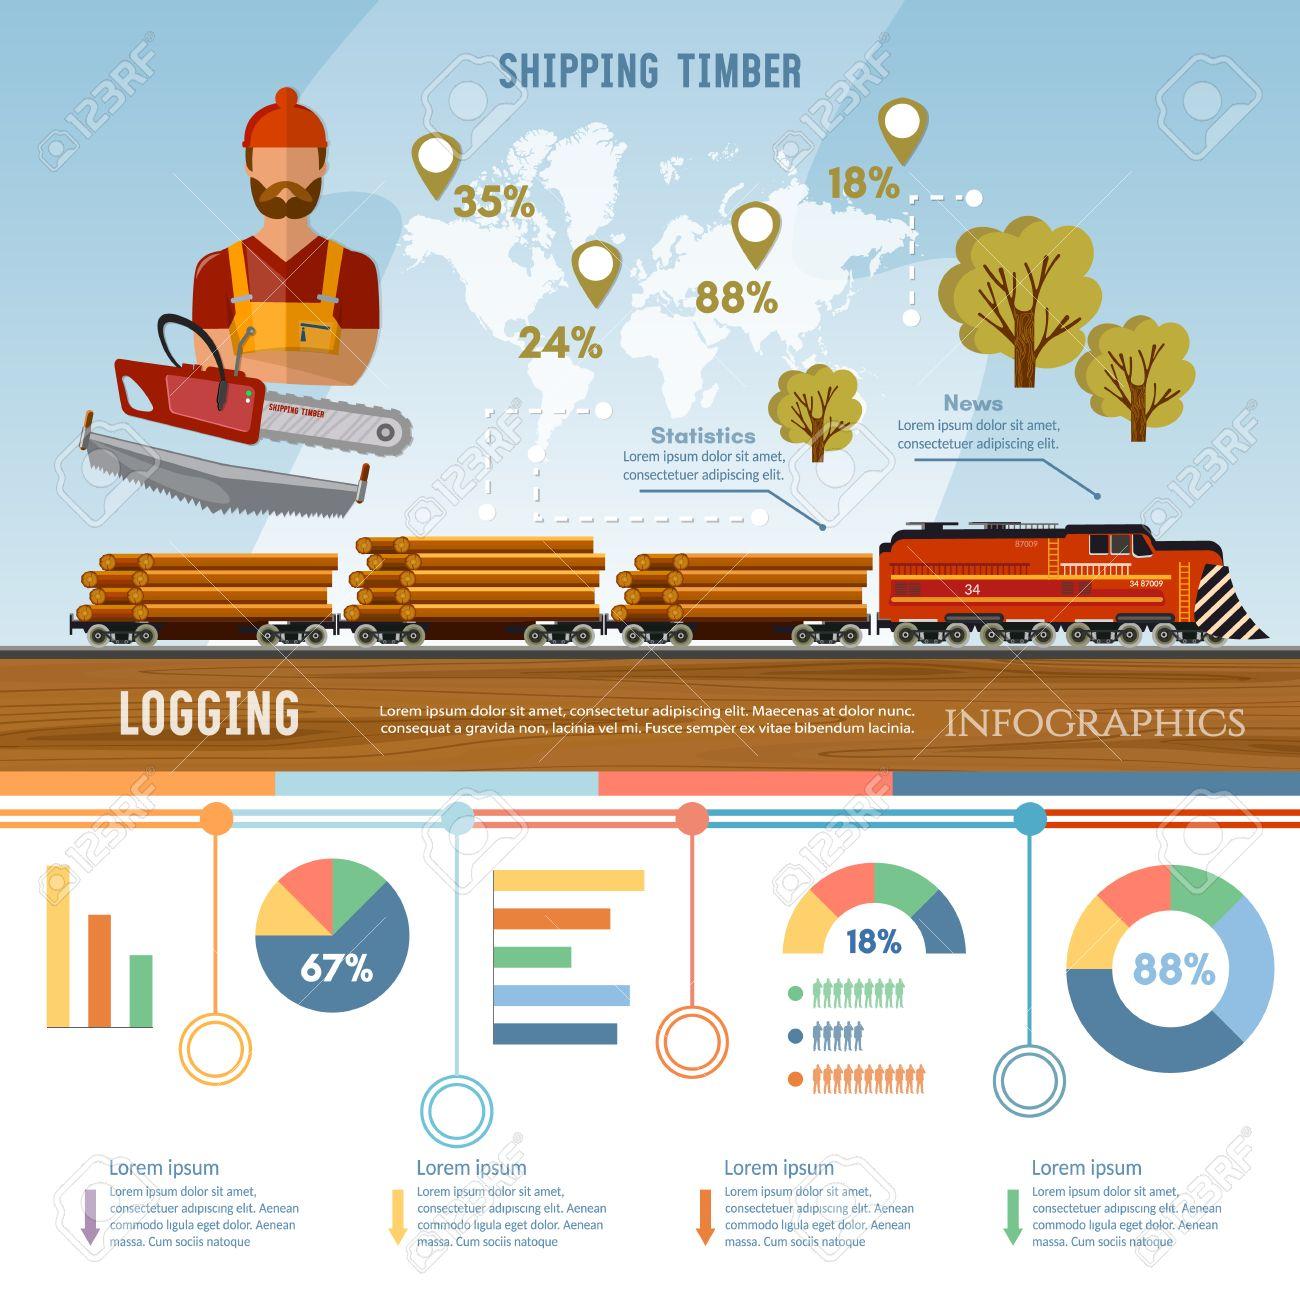 Logging industry infographic  Deforestation, preparation of firewood,